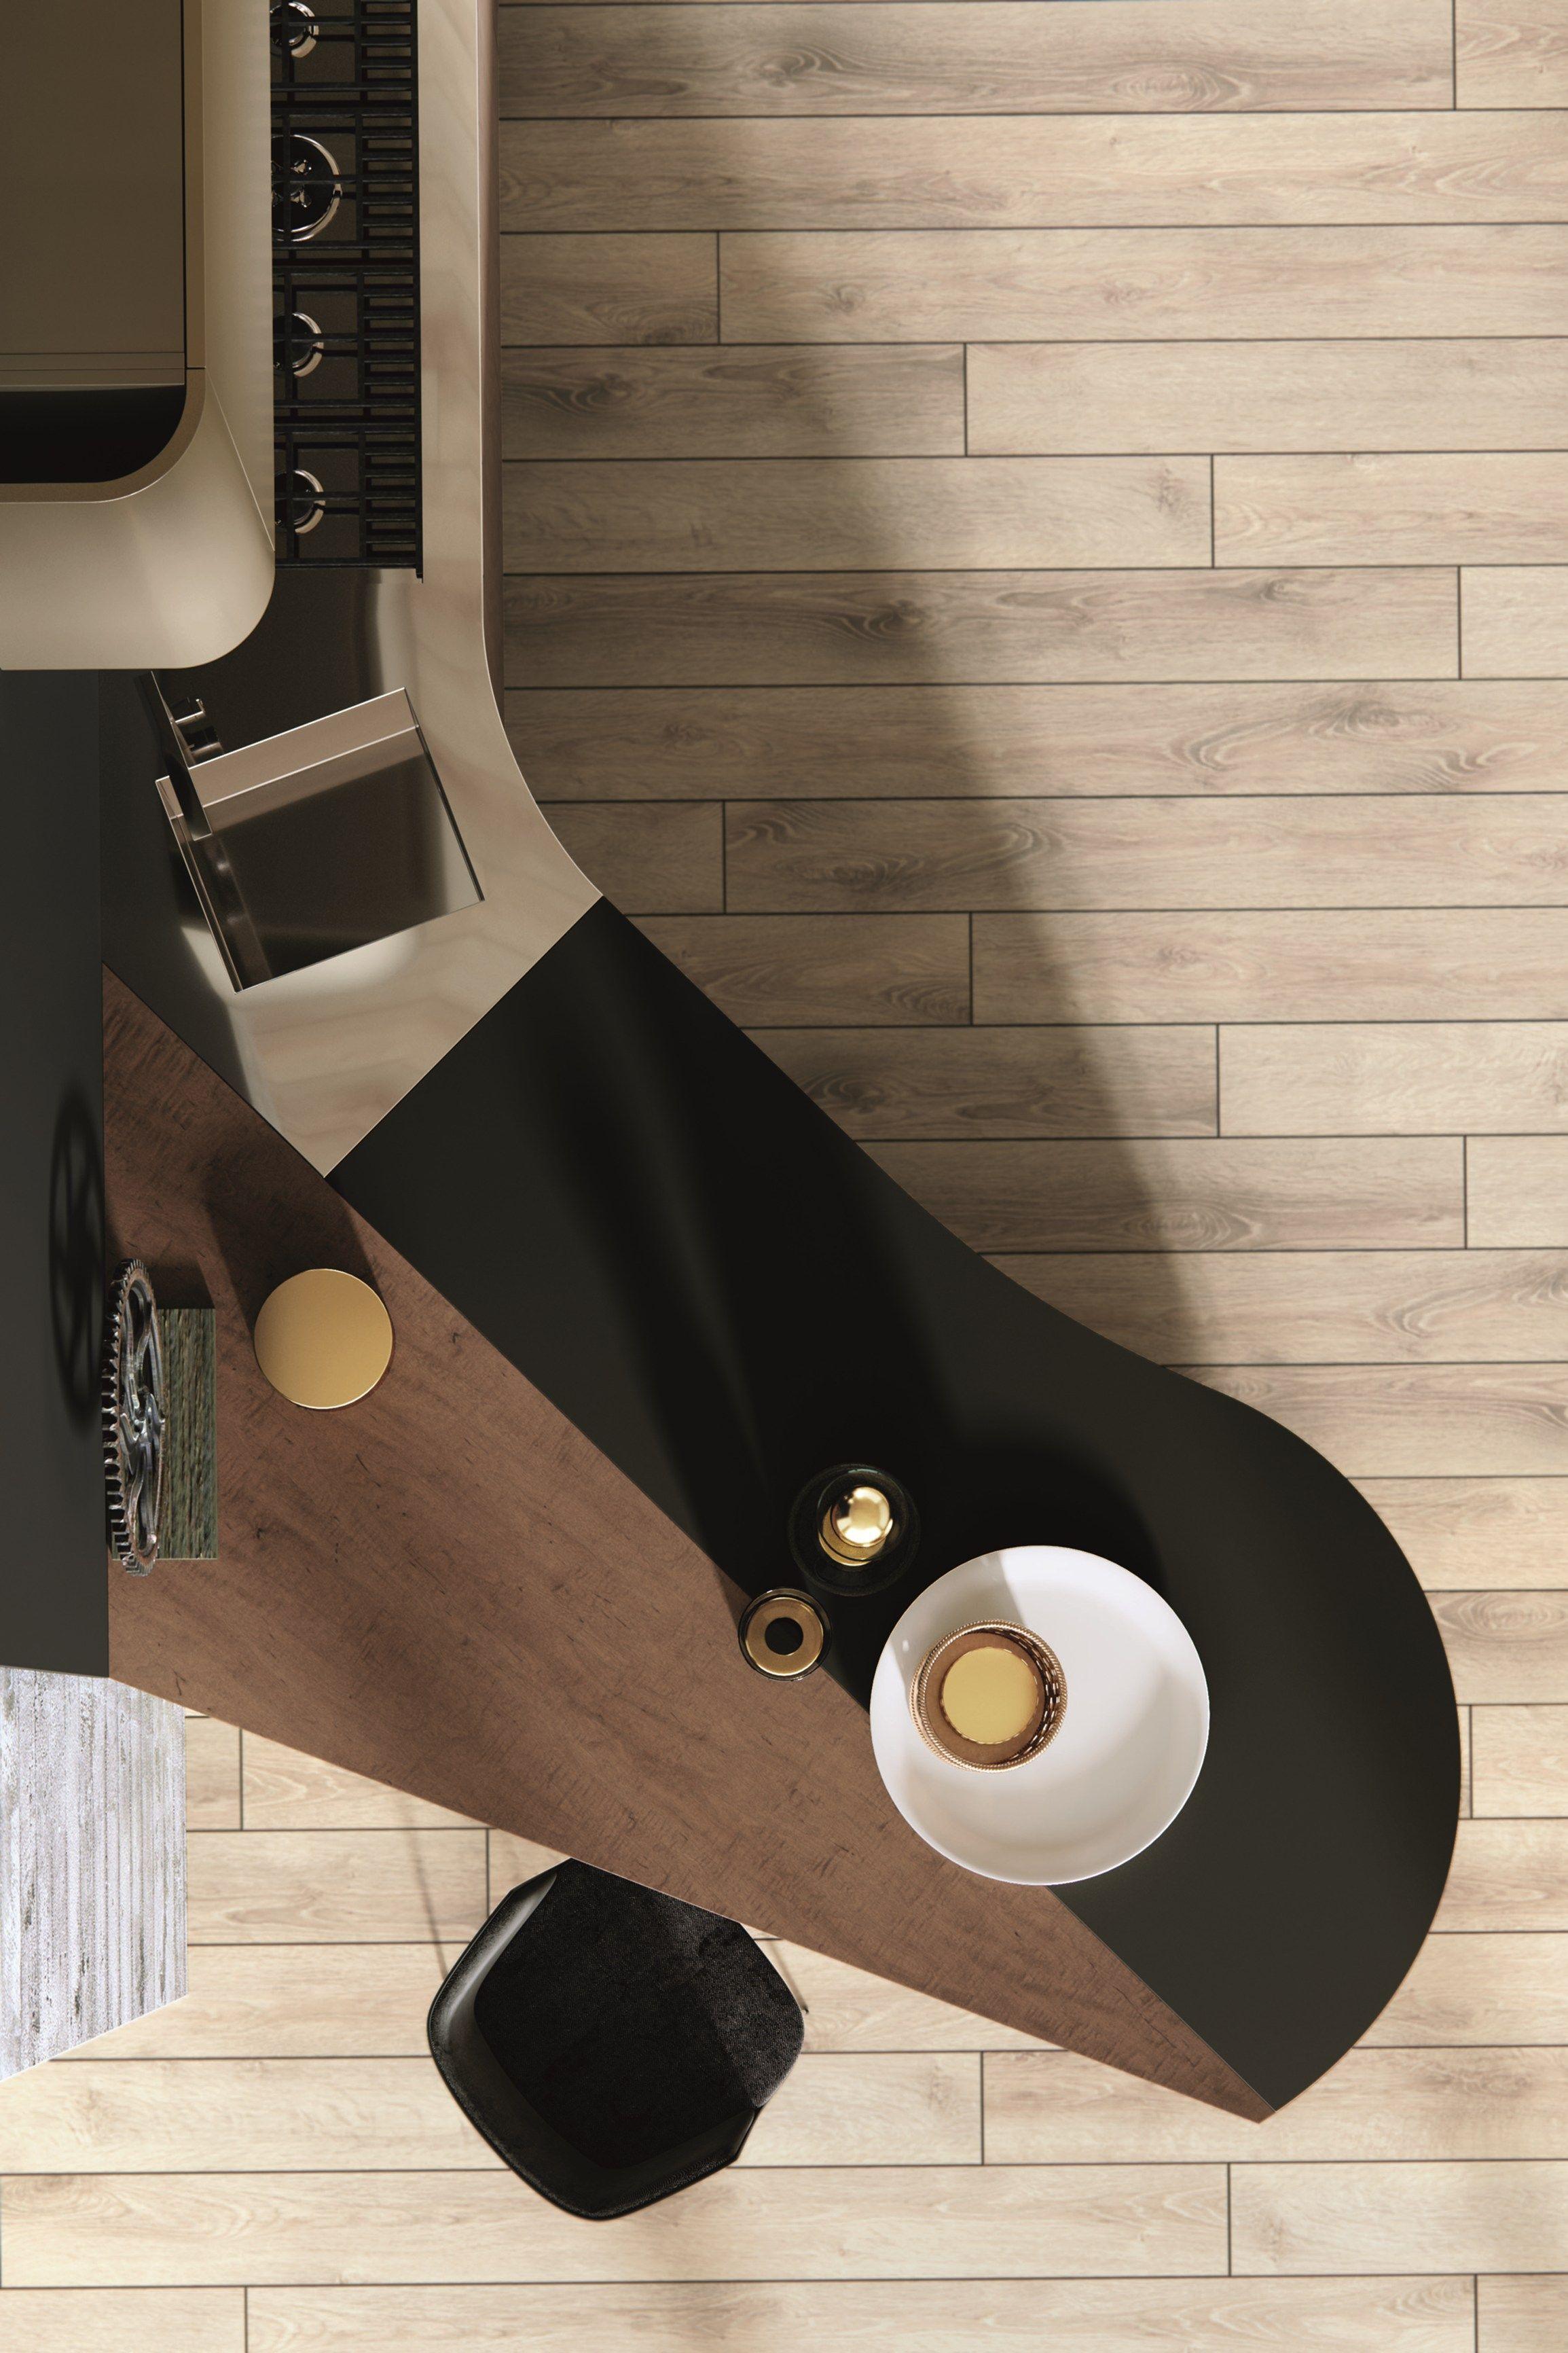 Stunning Aster Cucine Spa Photos - acrylicgiftware.us ...